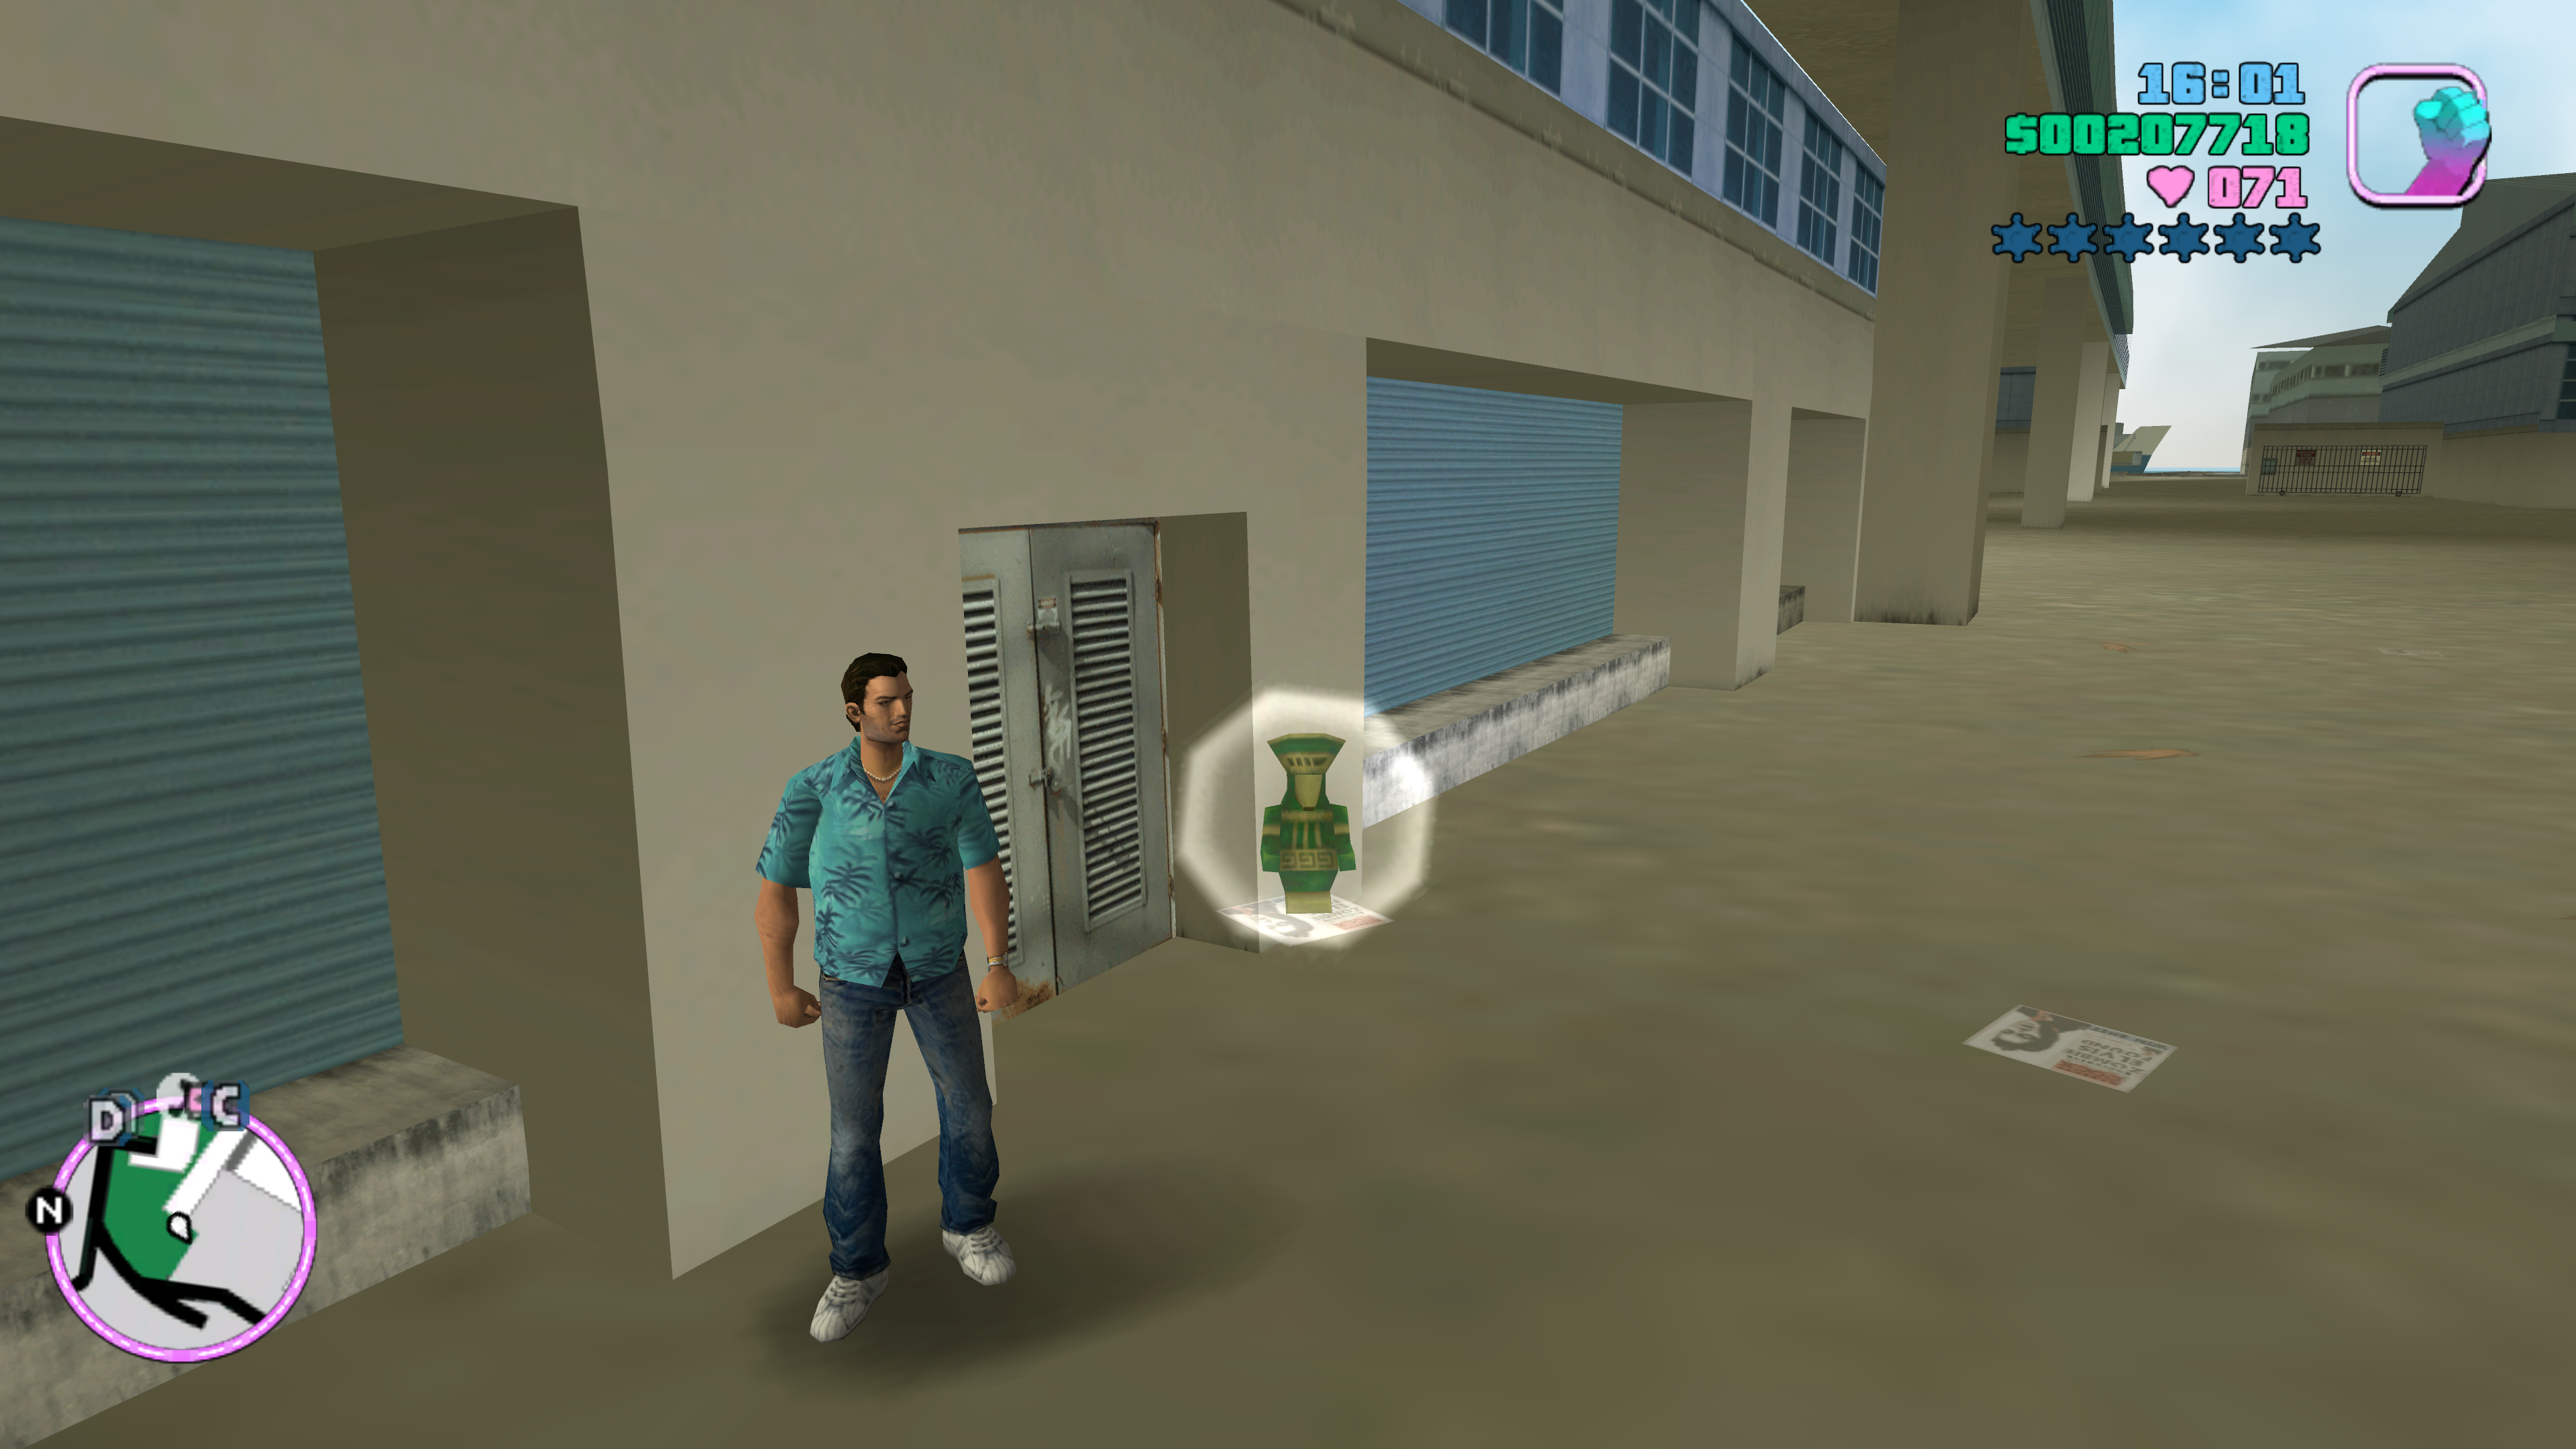 Archivo:GTA VC Objeto Oculto 86.PNG